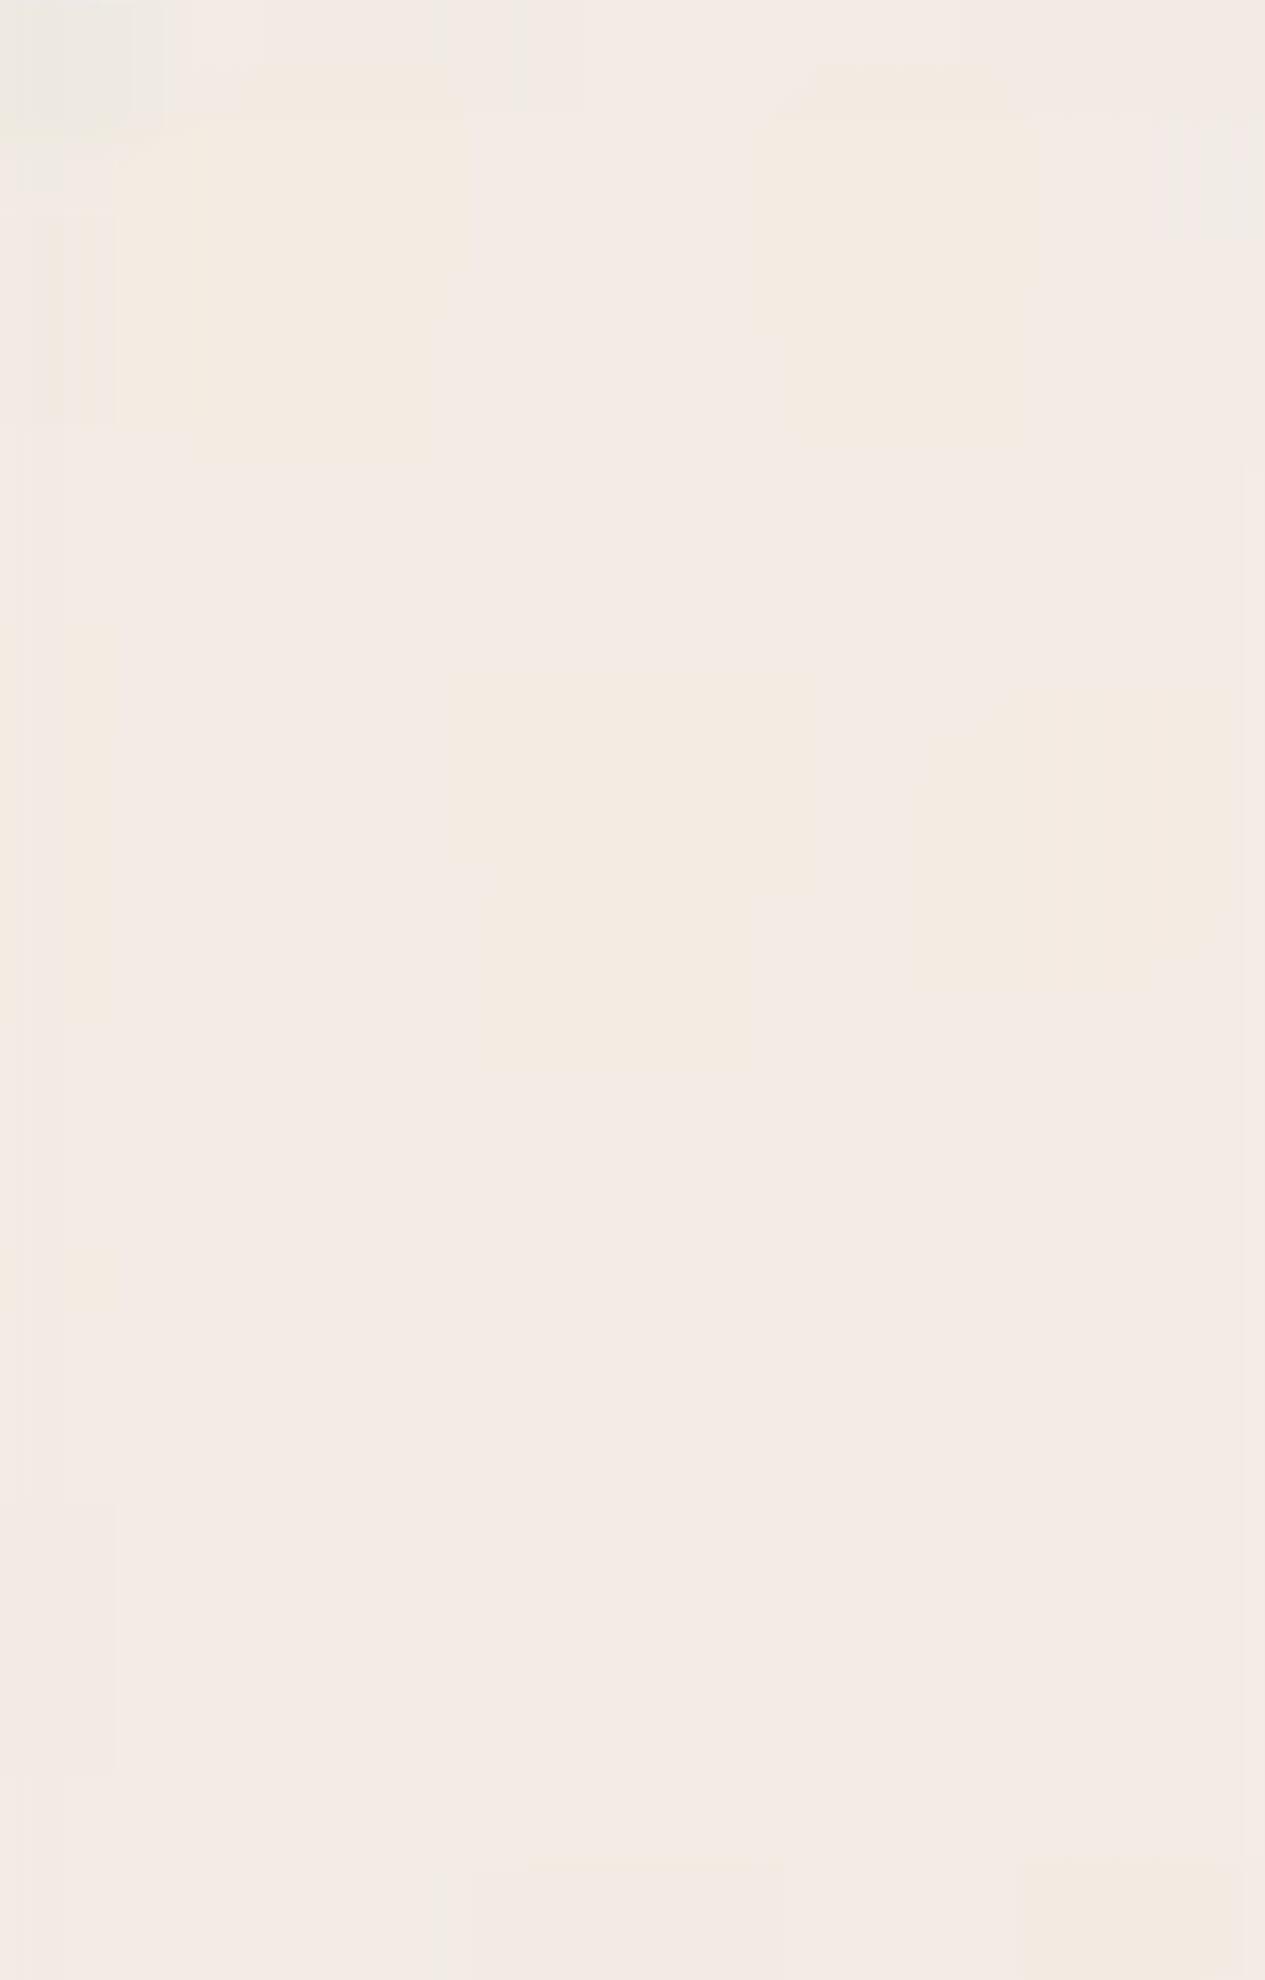 Gary Hume-Magnolia XXII-1990